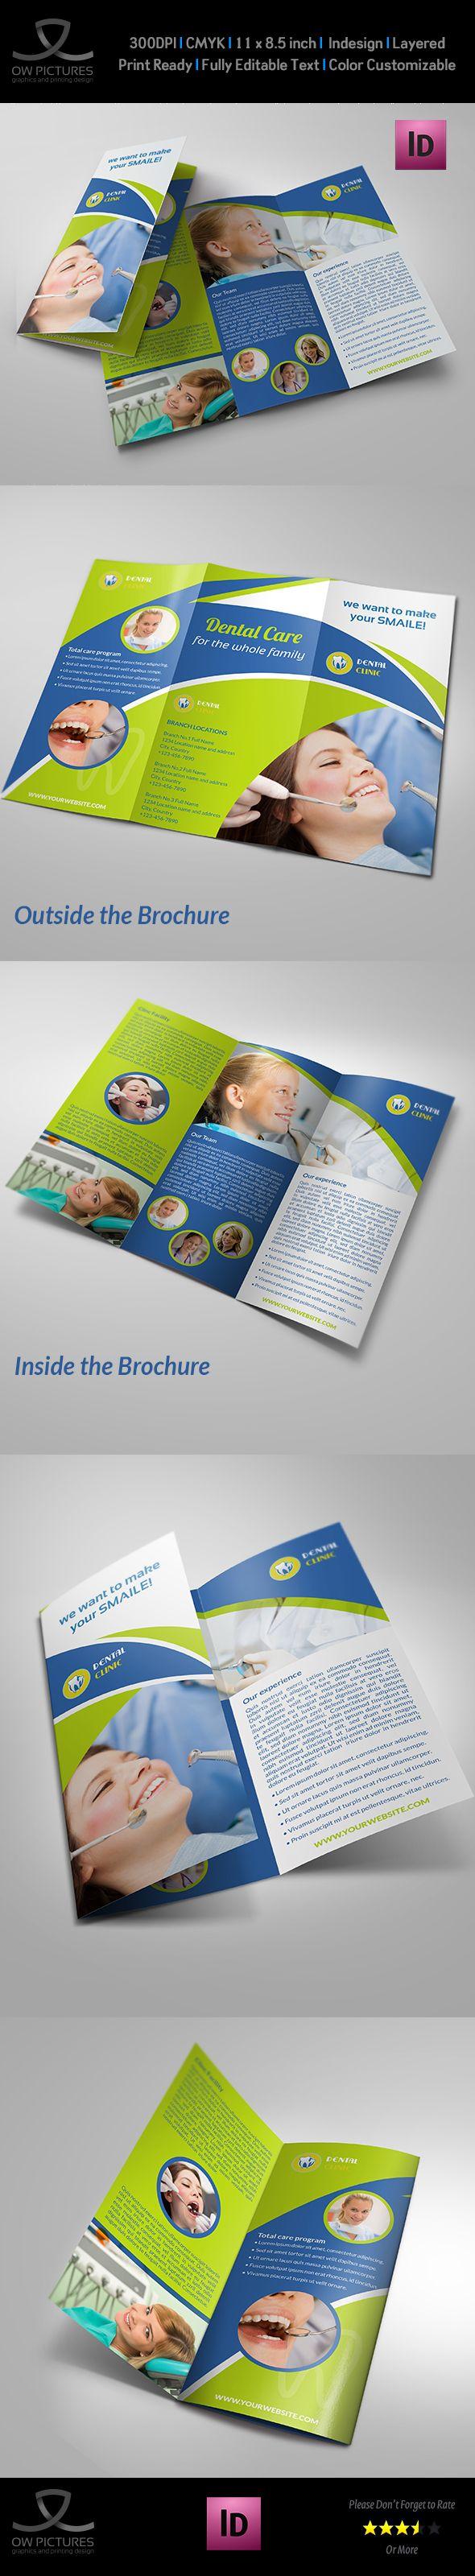 63 best trifold images on Pinterest | Brochure template, Brochures ...